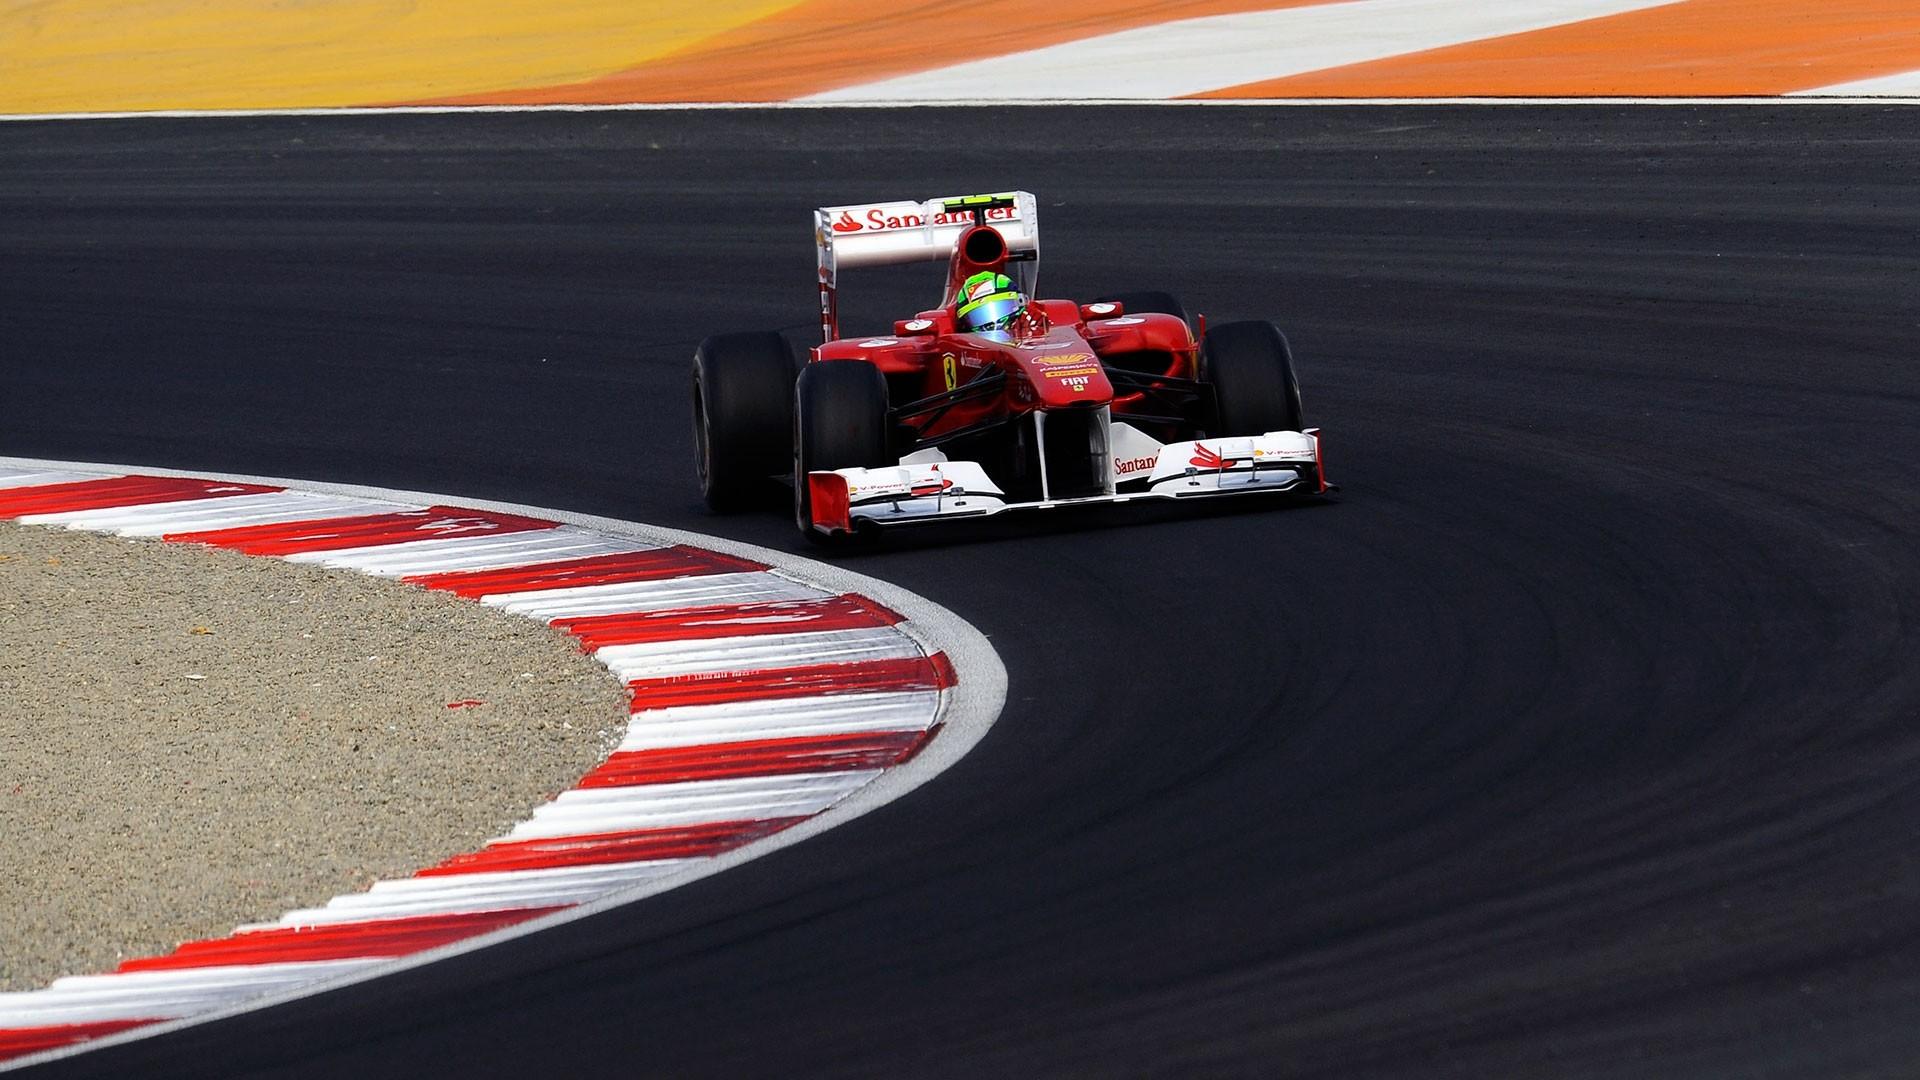 Formula 1 wallpaper photo hd